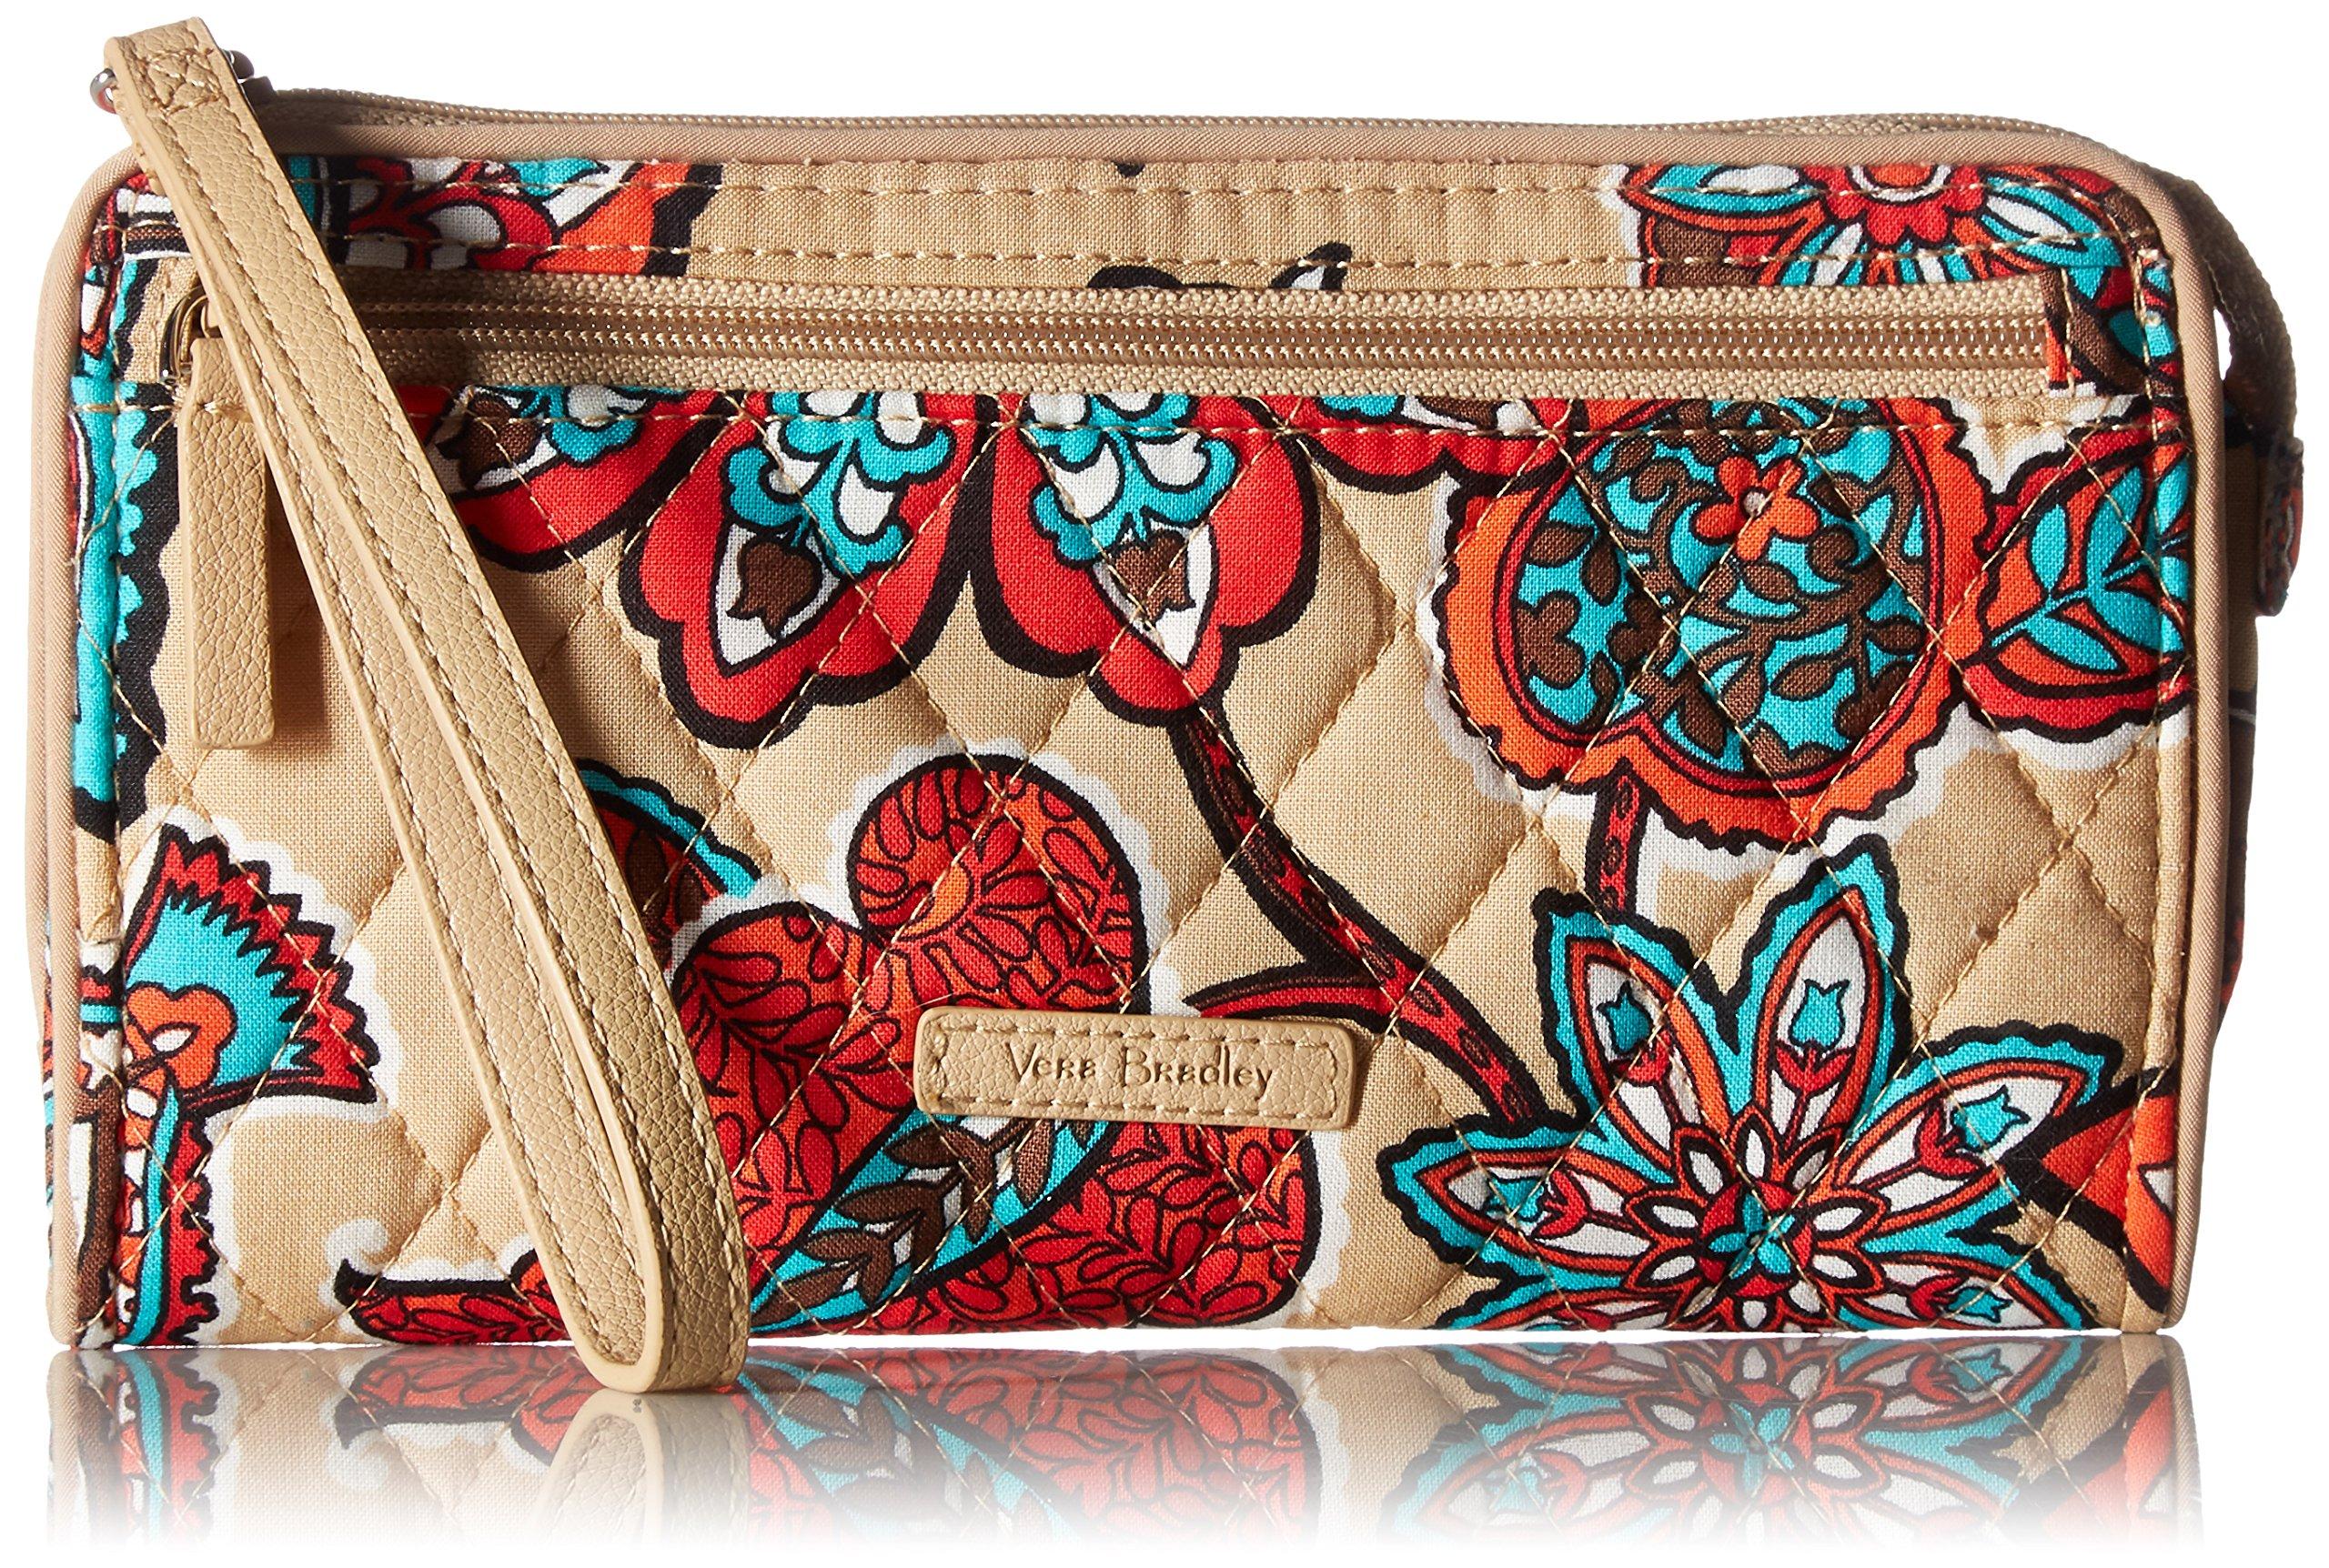 Vera Bradley Rfid Front Zip Wristlet, Signature Cotton